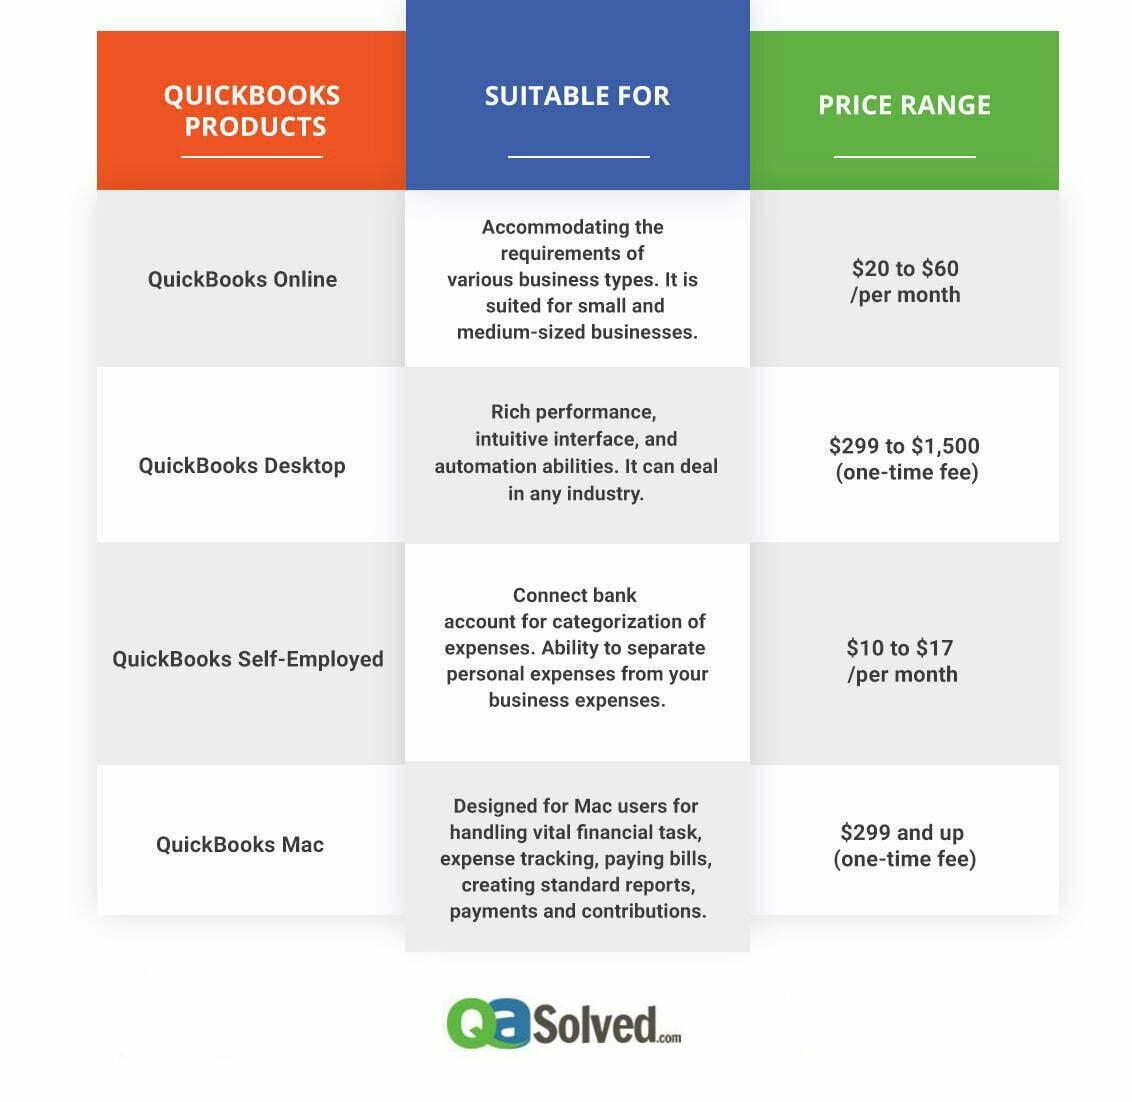 quickbooks version types infographic